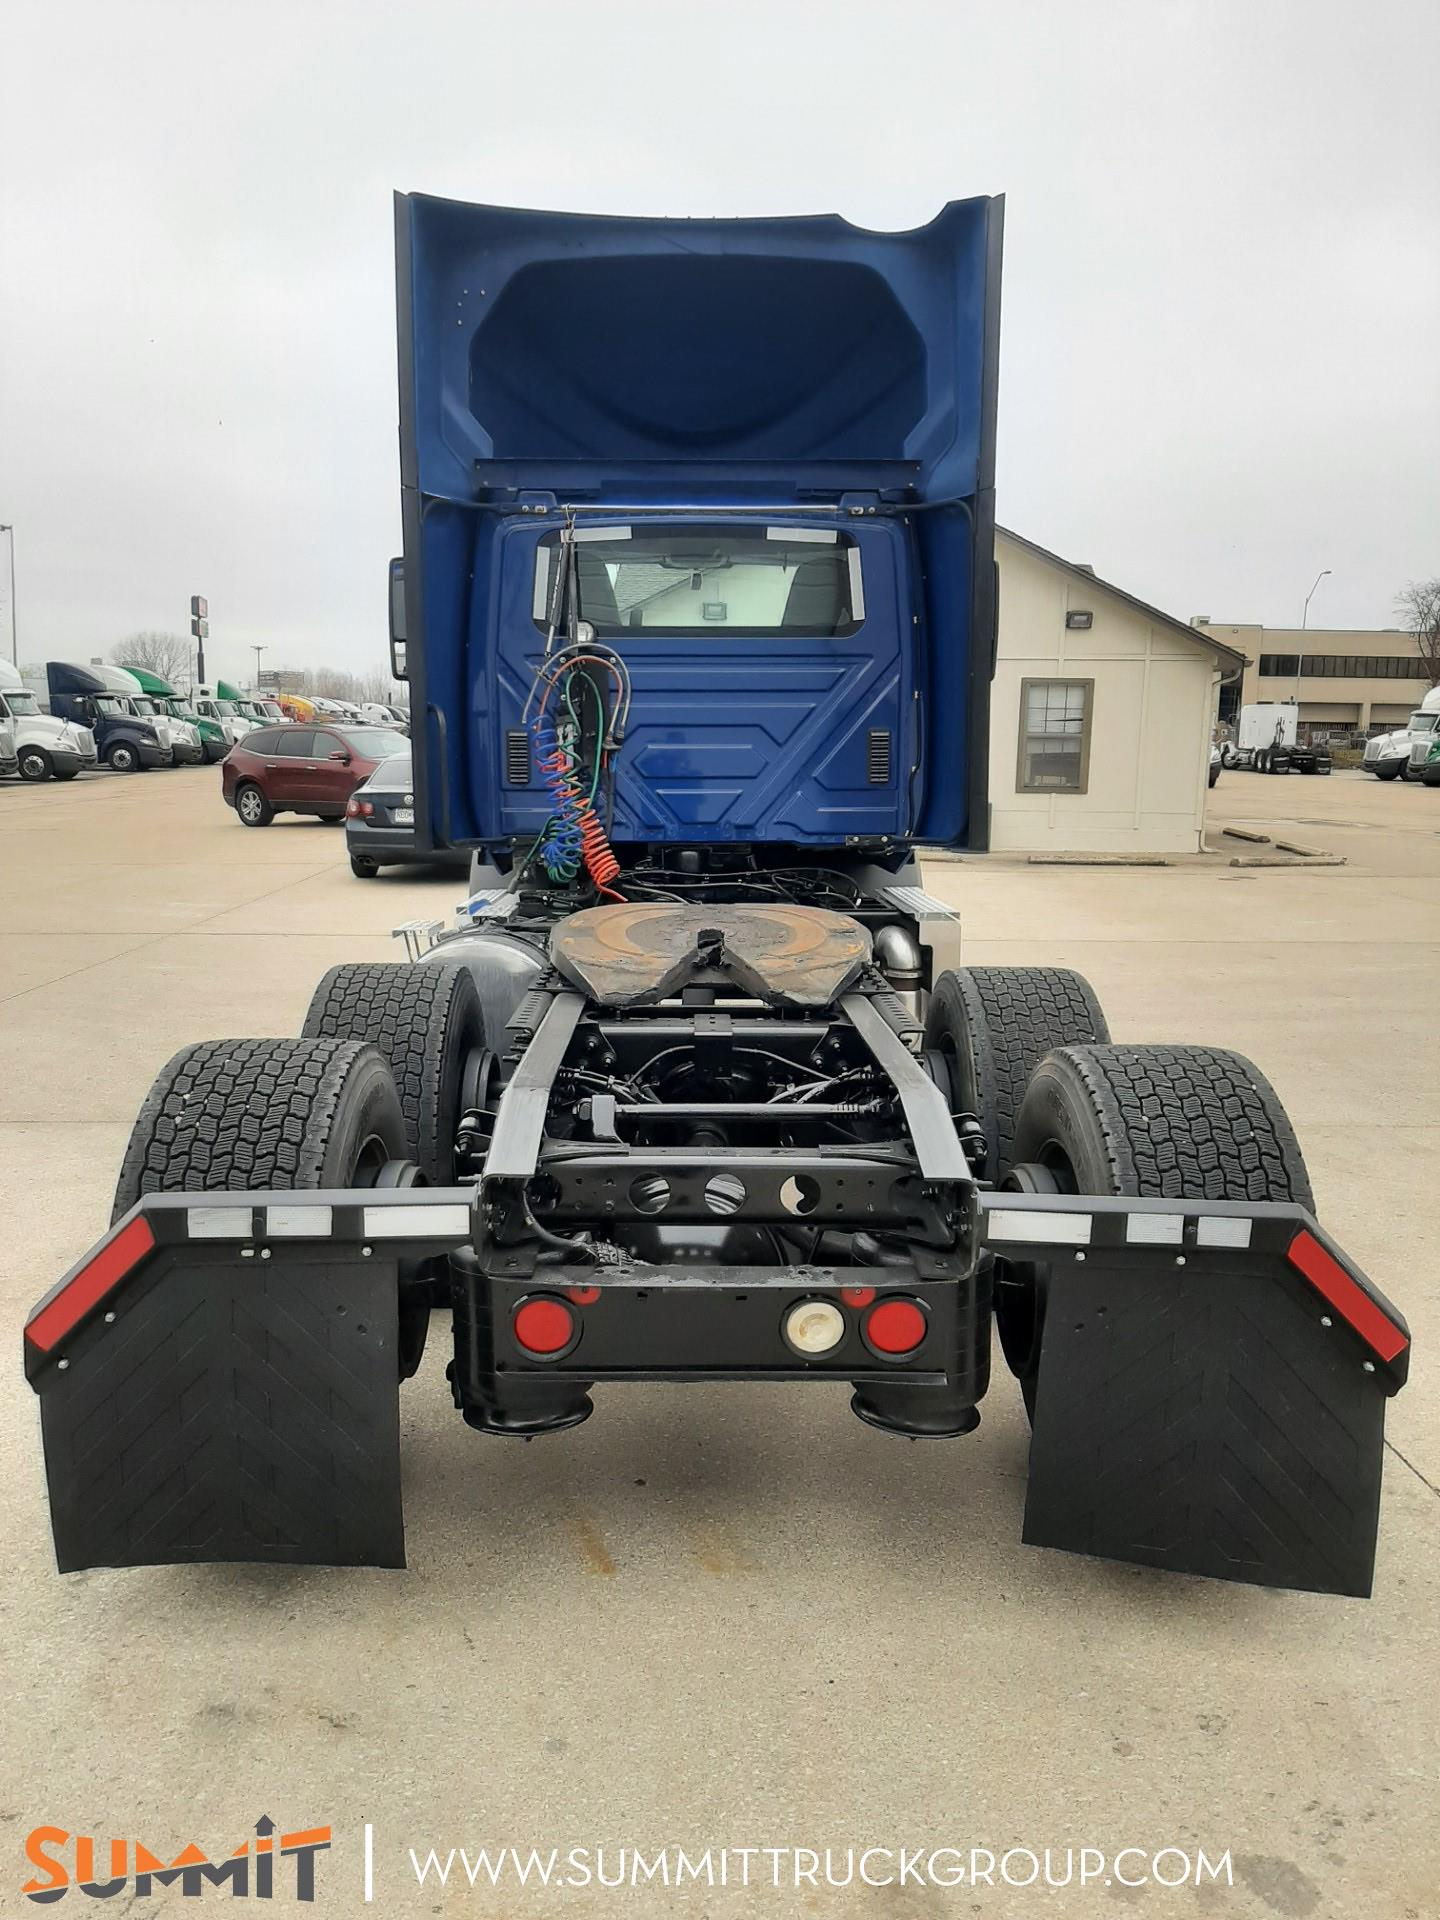 2017 International ProStar+ 6x4, Tractor #135N210207 - photo 1